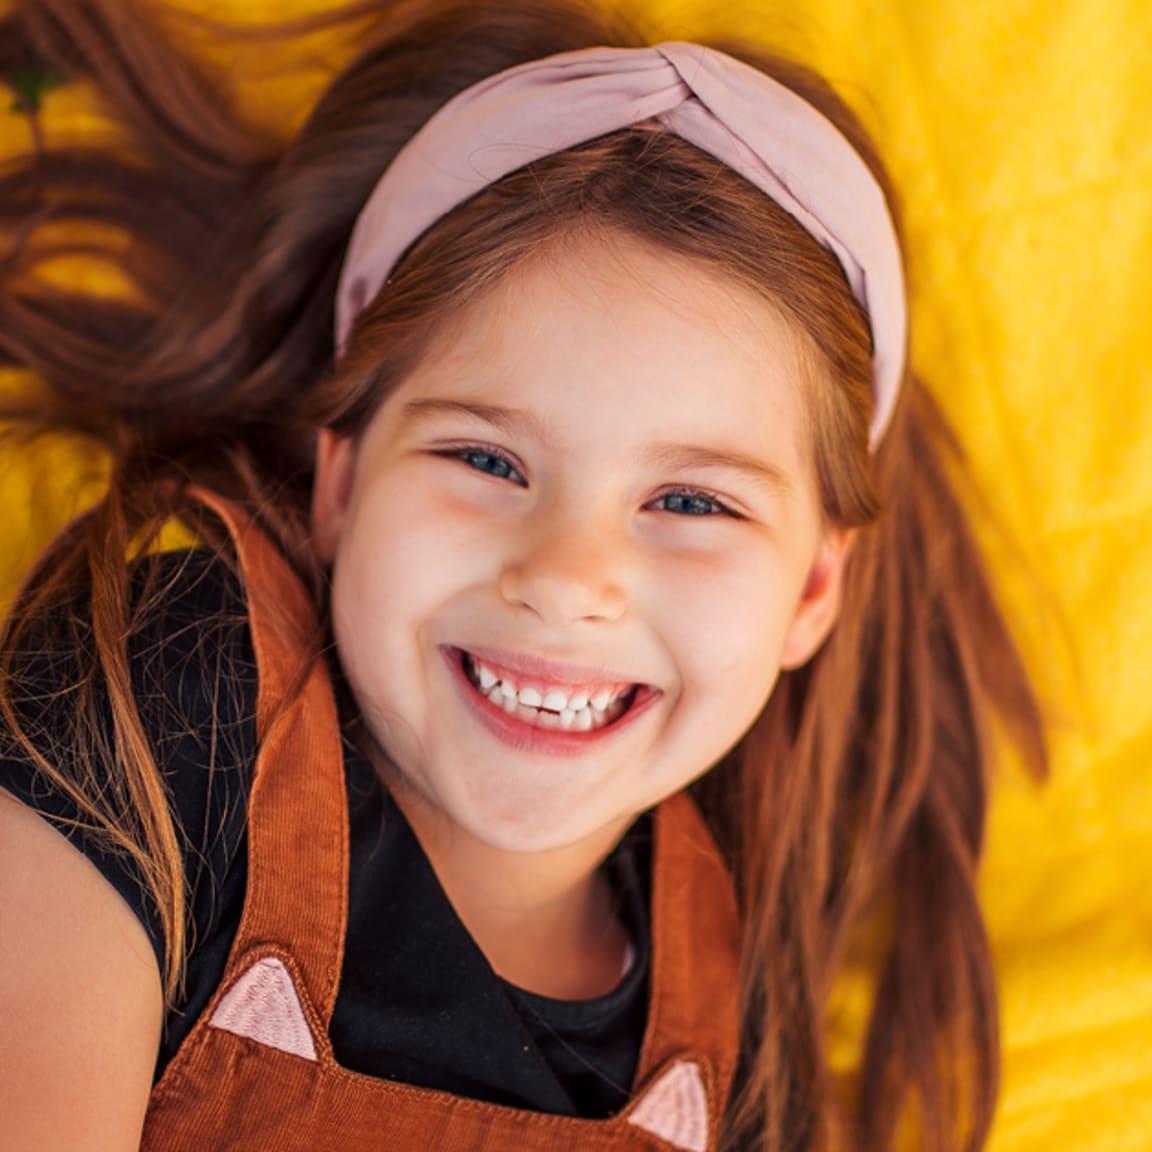 Pacific Smiles Dental: Free kids dental*